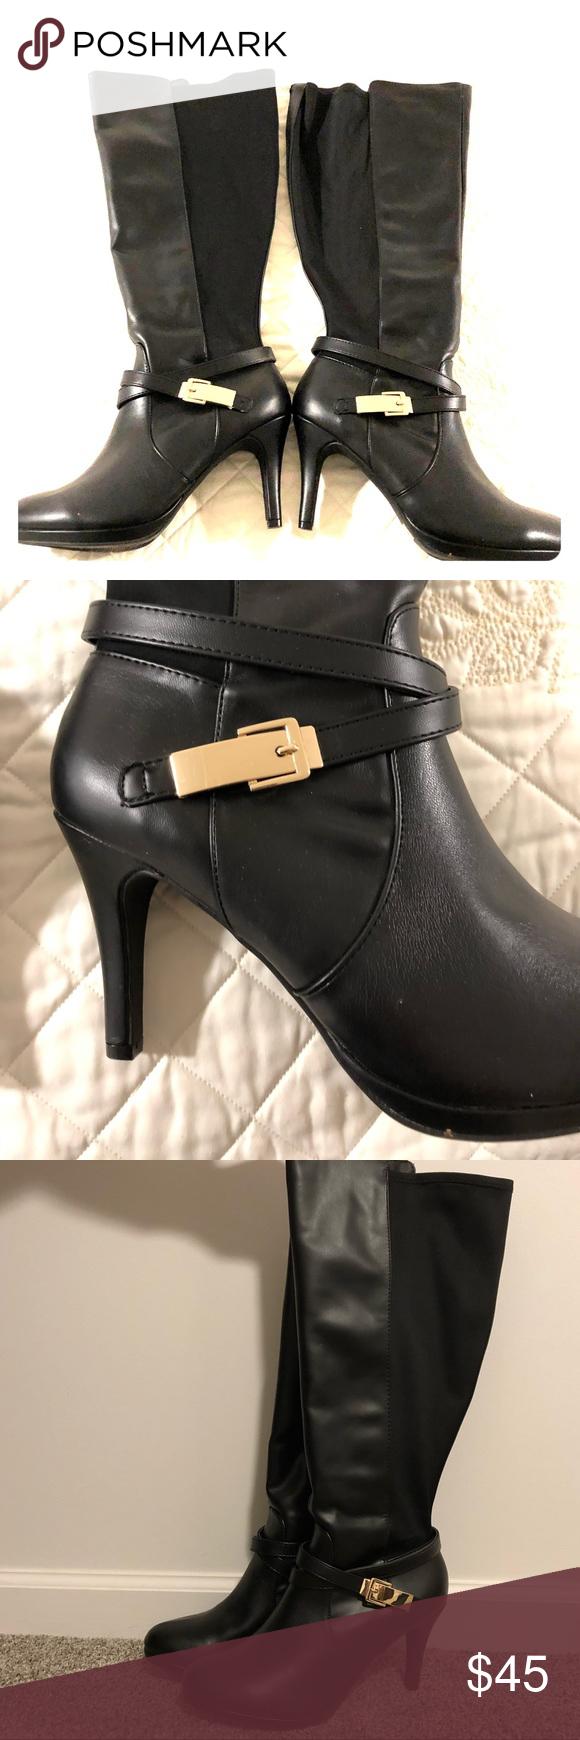 Black heel boots, Wide calf boots